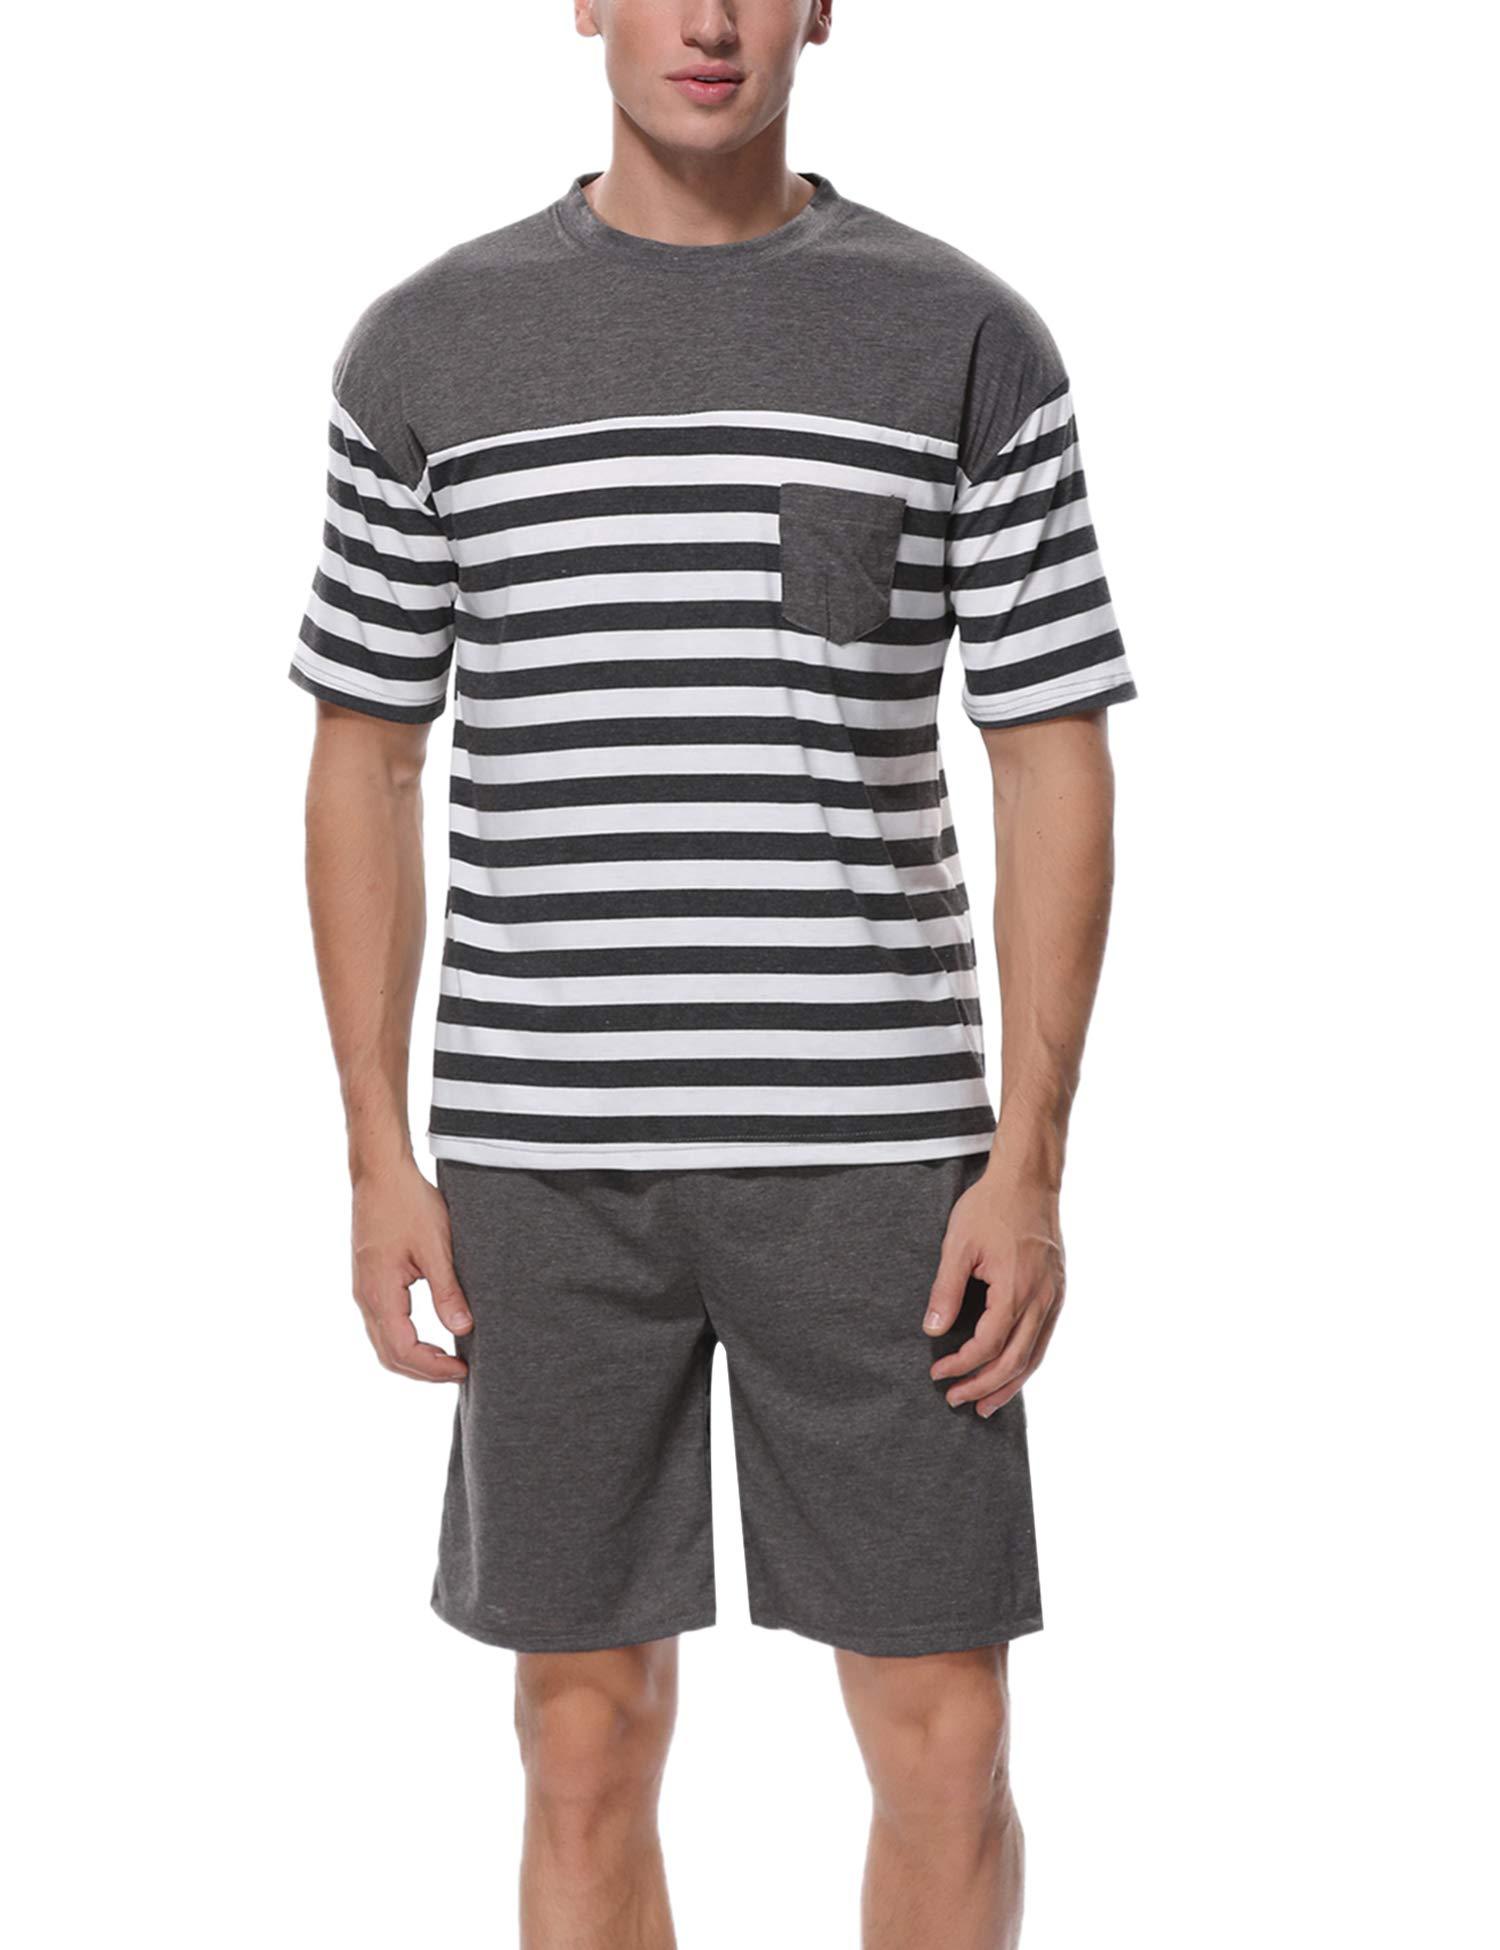 Aiboria Men's Short Pajama Set Cotton Summer Sleepwear Soft Striped Tops and Solid Color Shorts Lounge Set